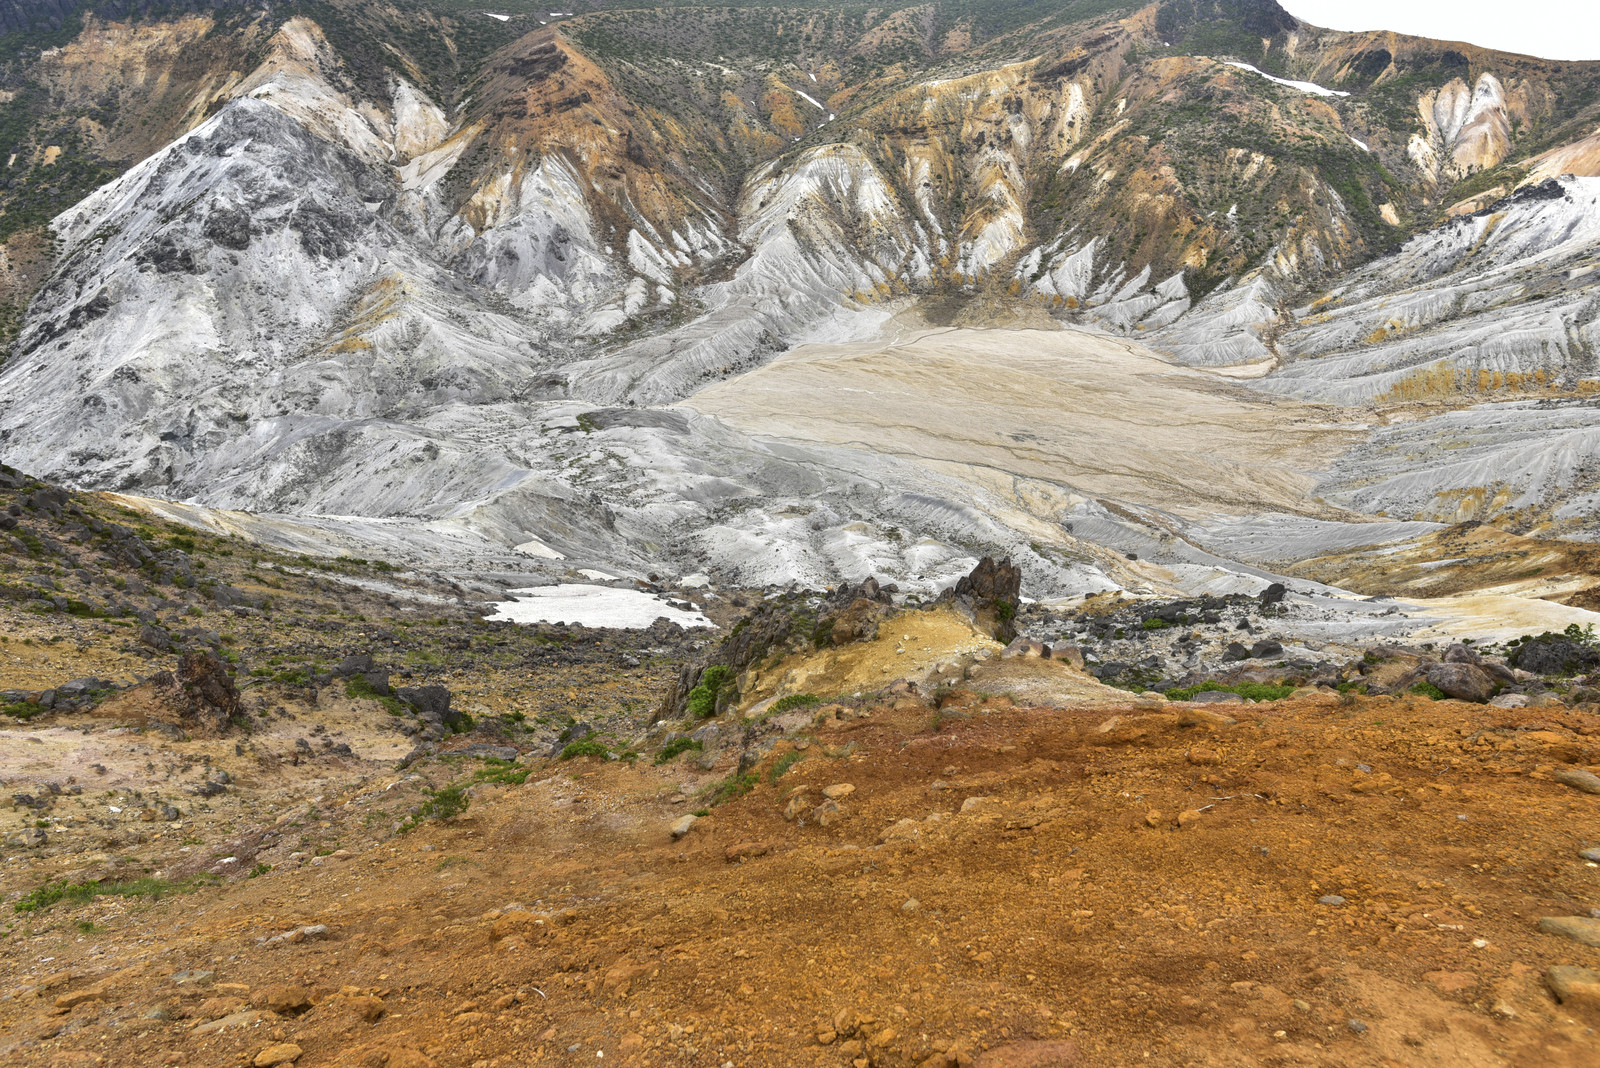 「安達太良山沼ノ平方面」の写真